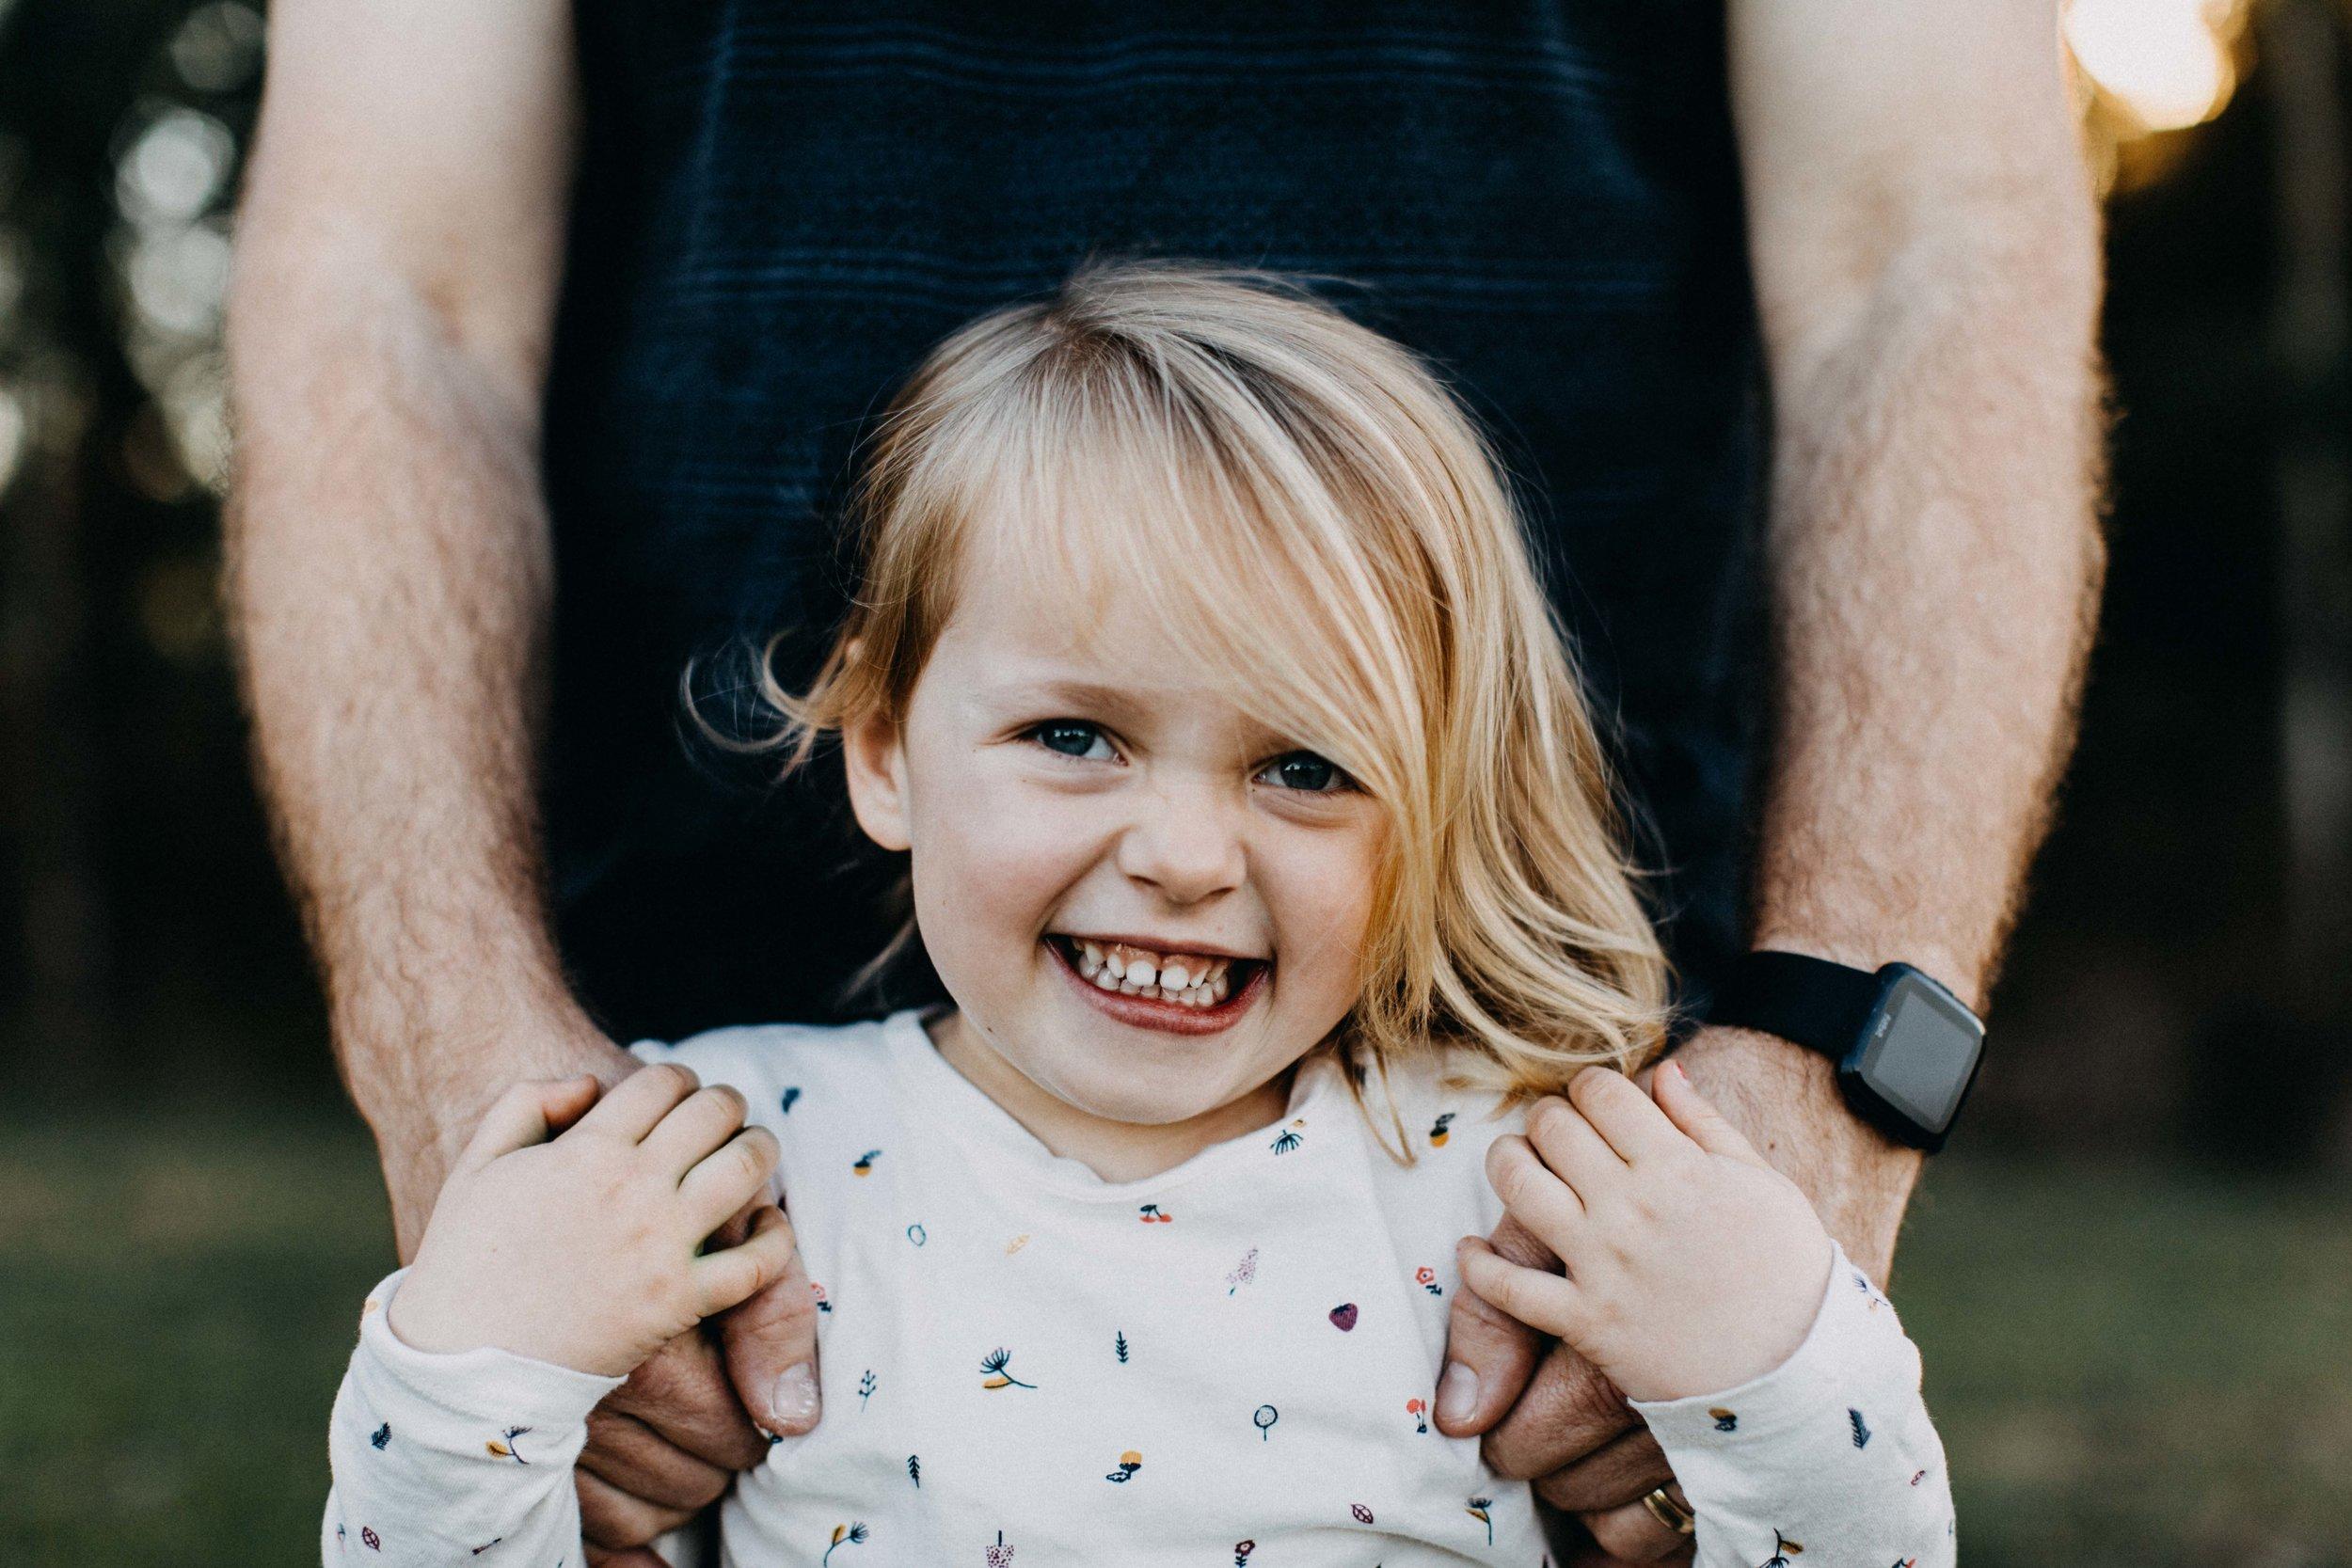 camden-family-photography-boot-family-session-16.jpg